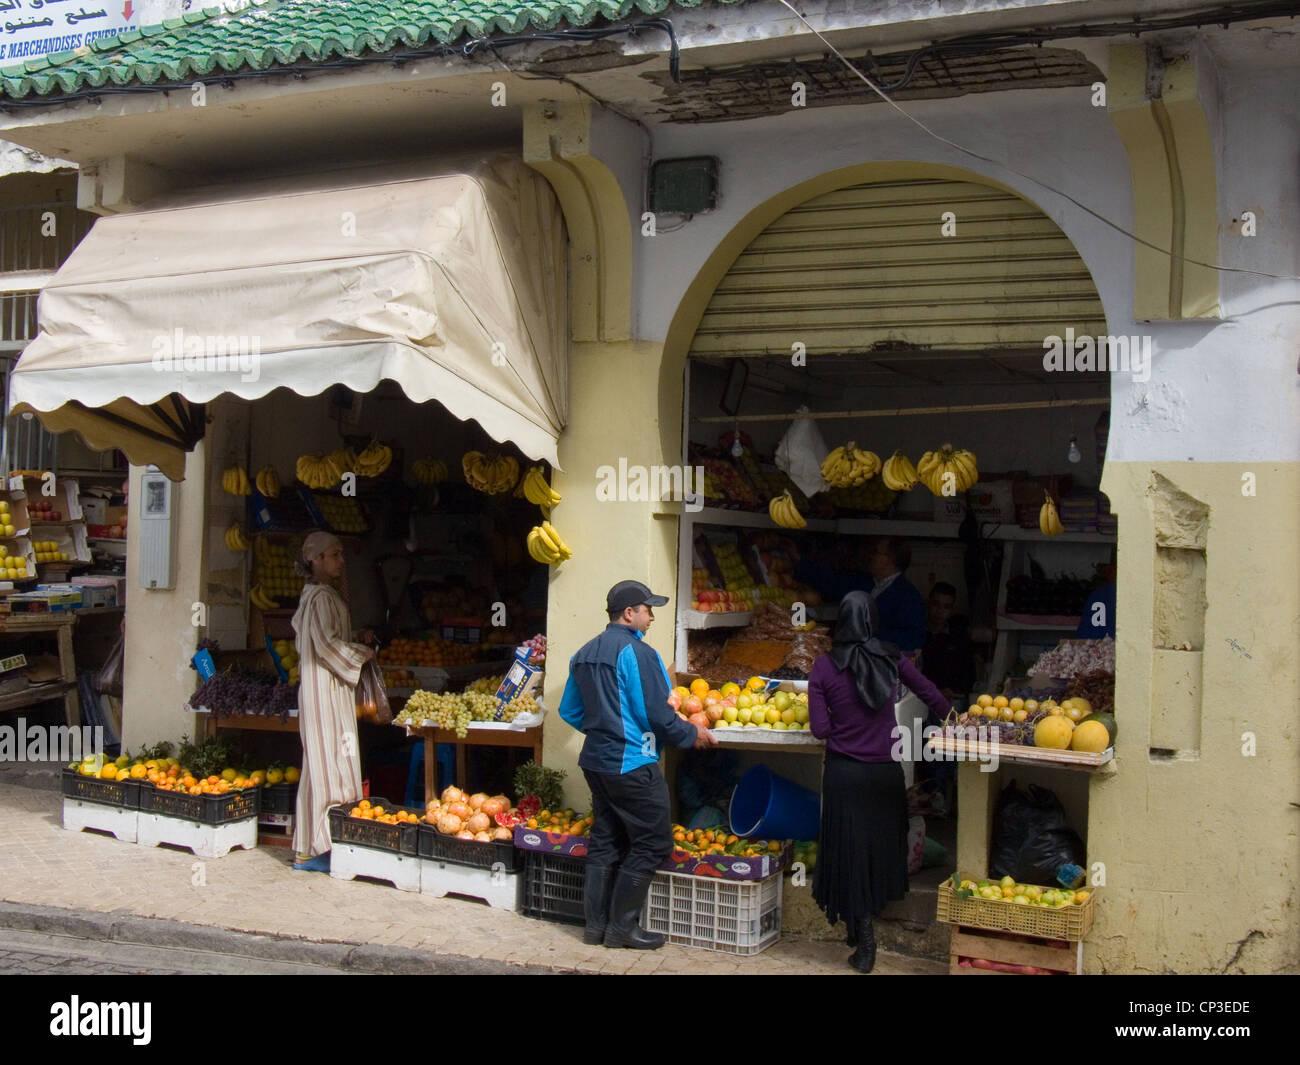 Fruit shop in Tangier - Stock Image